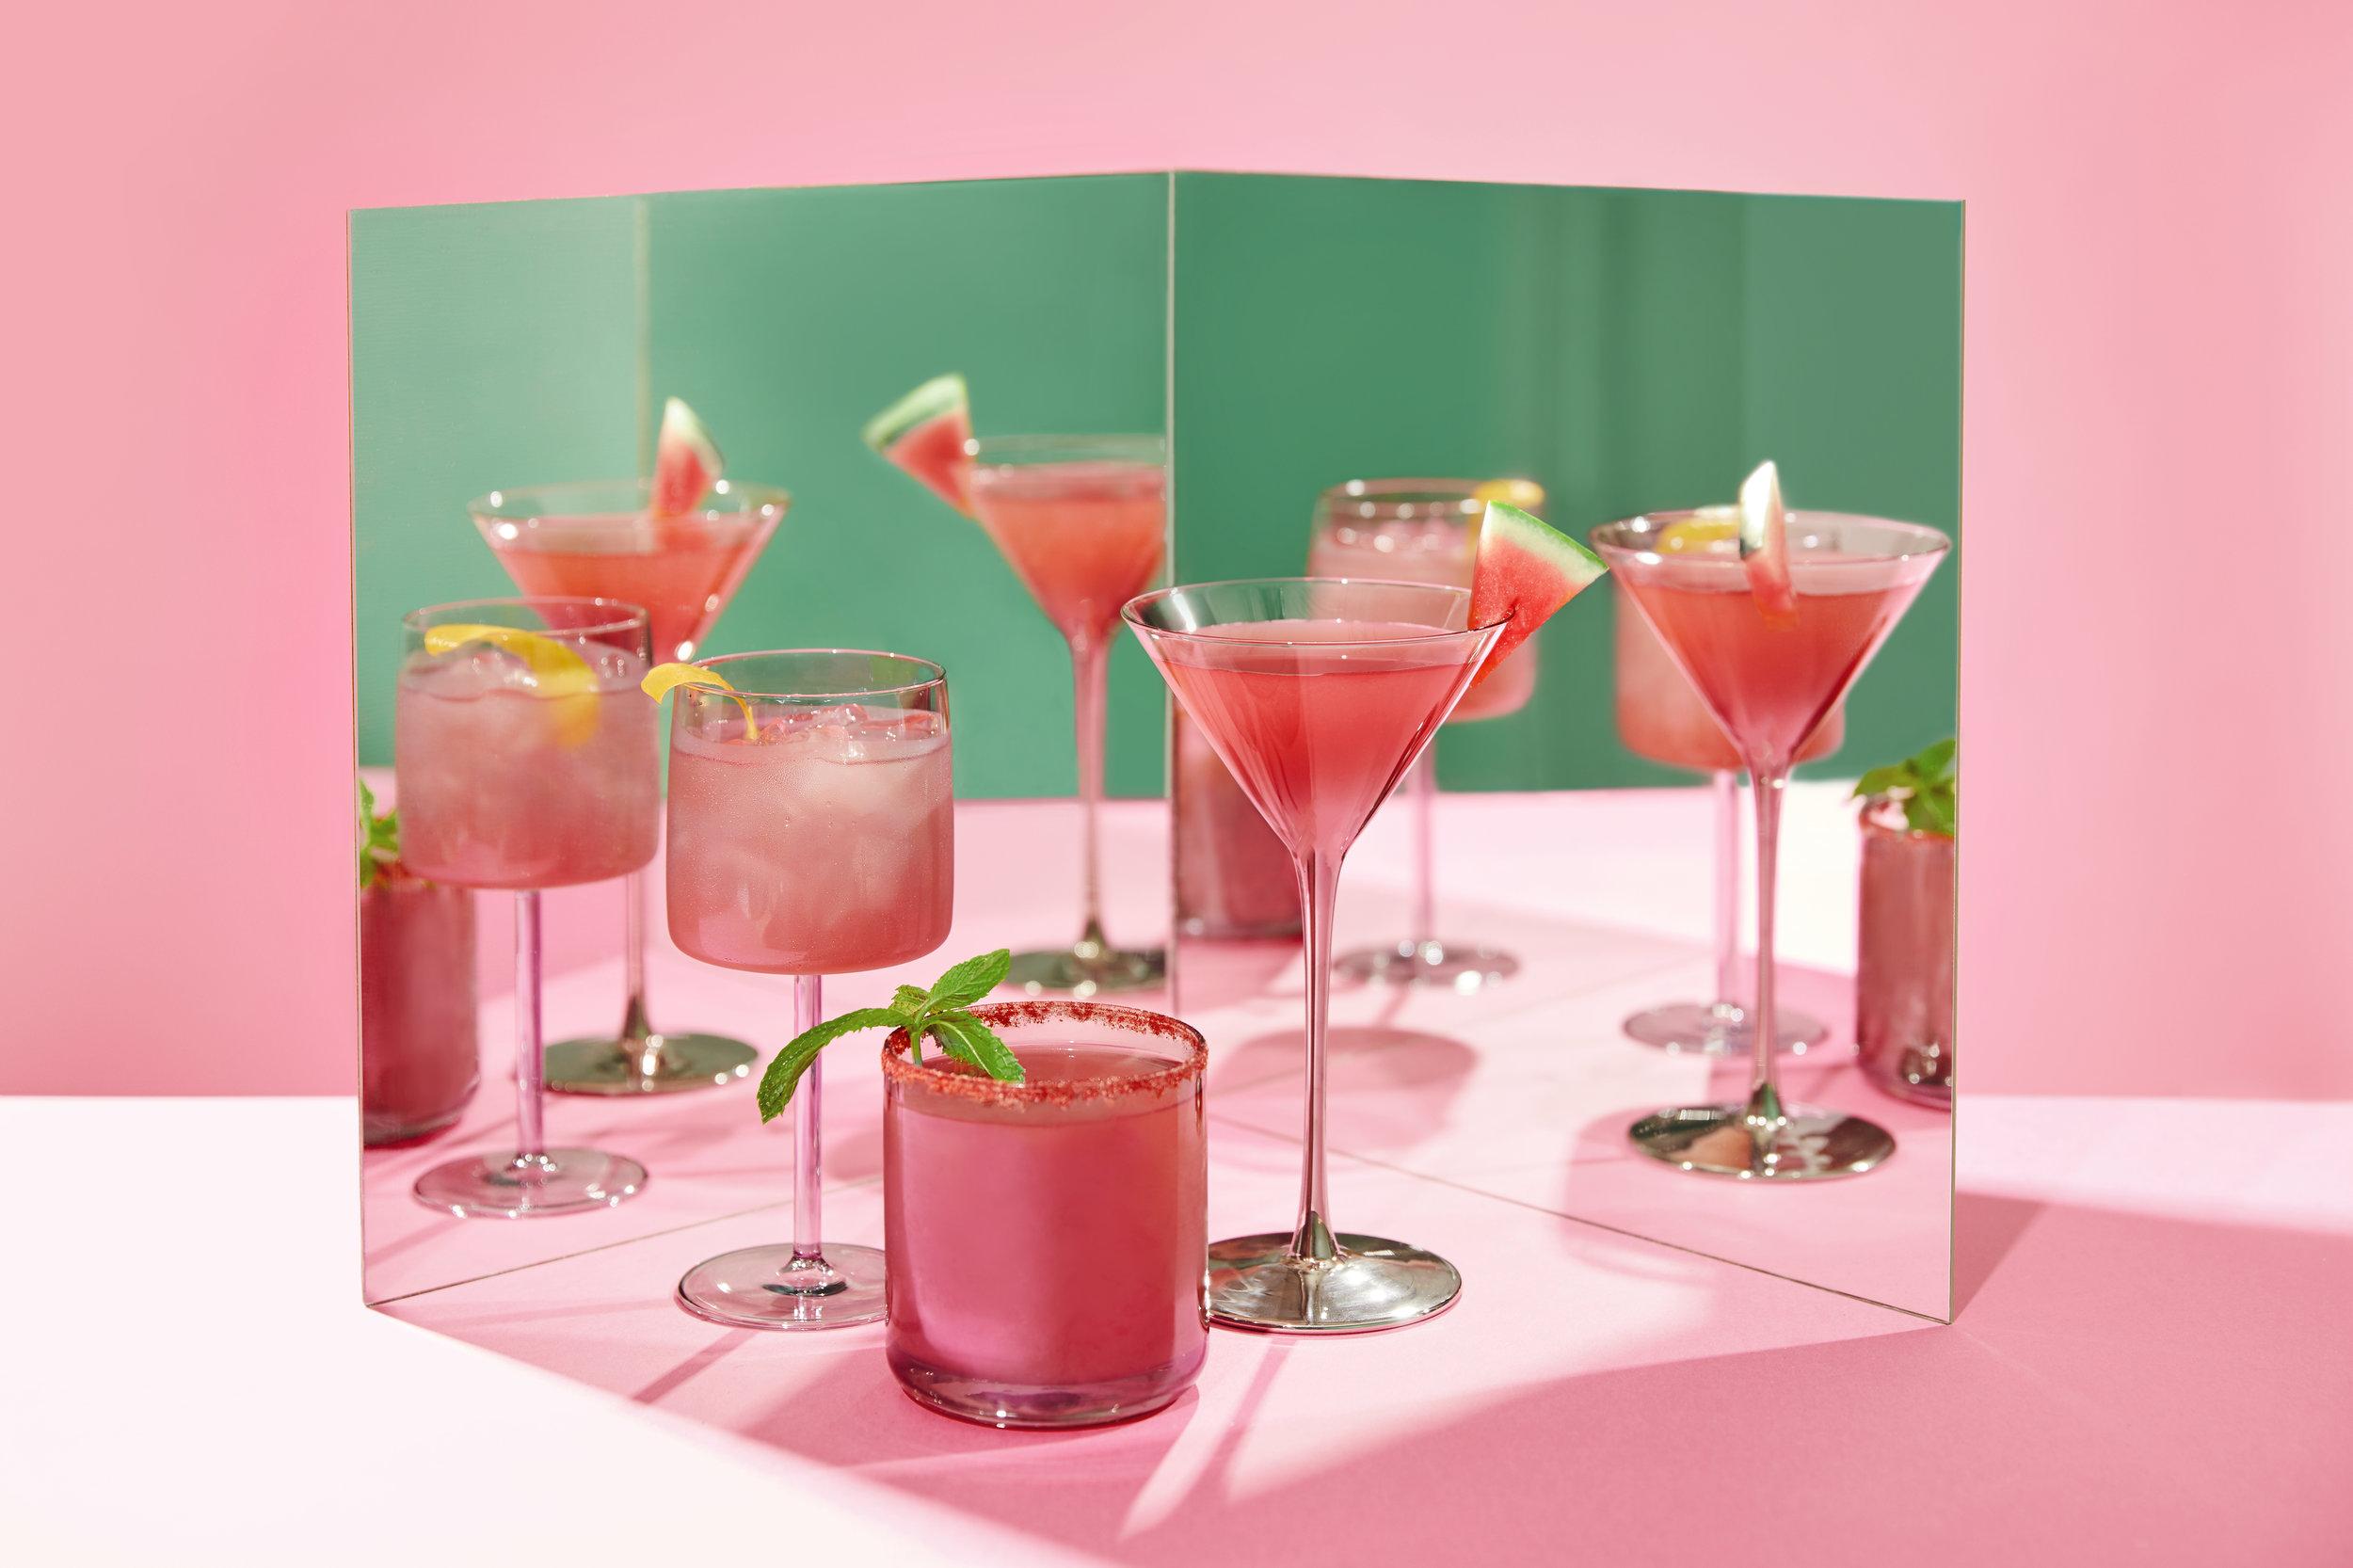 Skyy Vodka Watermelon Cocktails.jpg